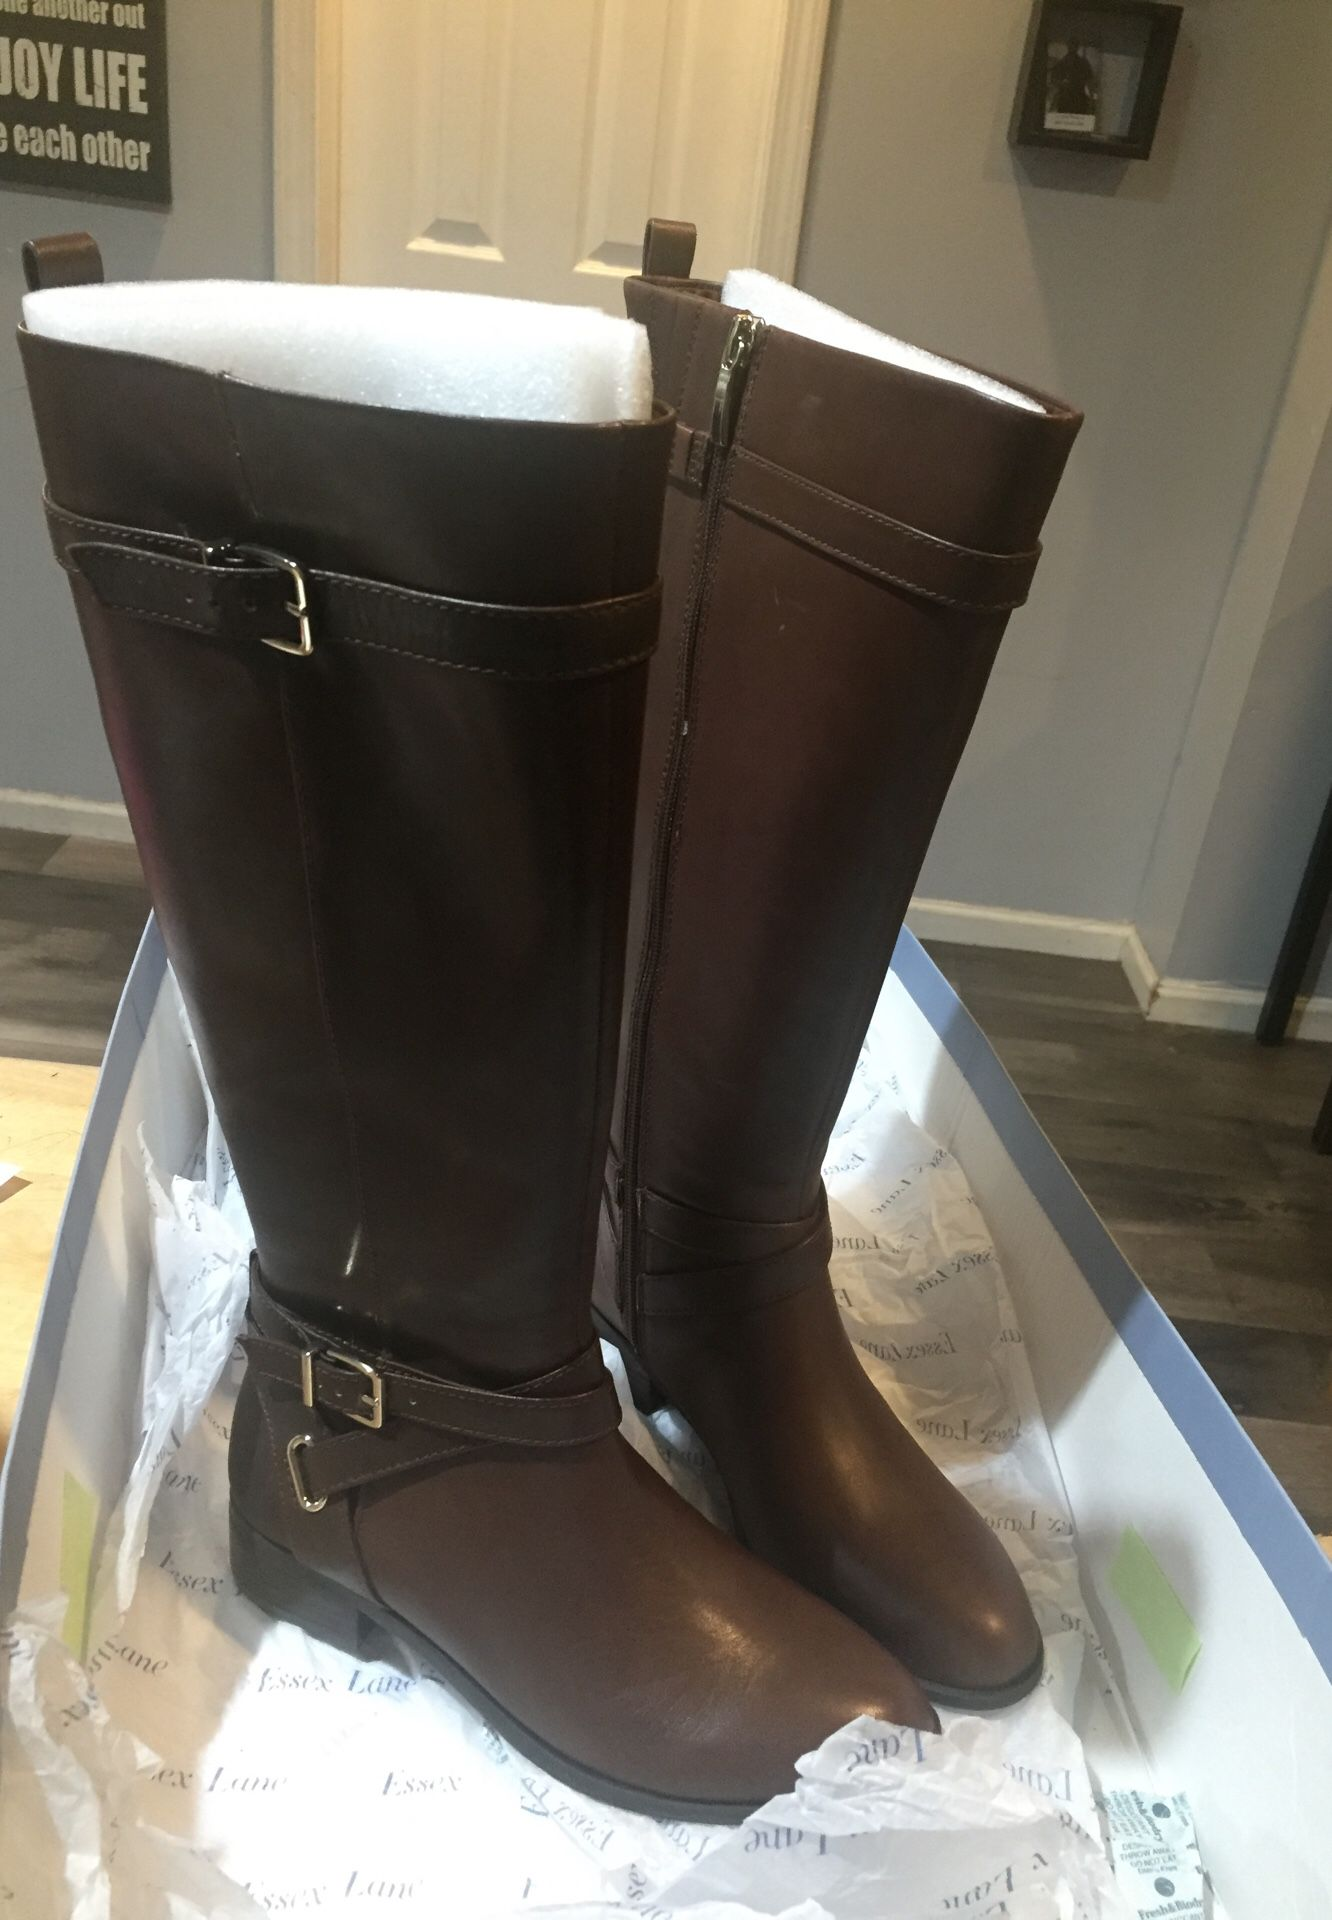 Brand New Essex Lane Winter Boots